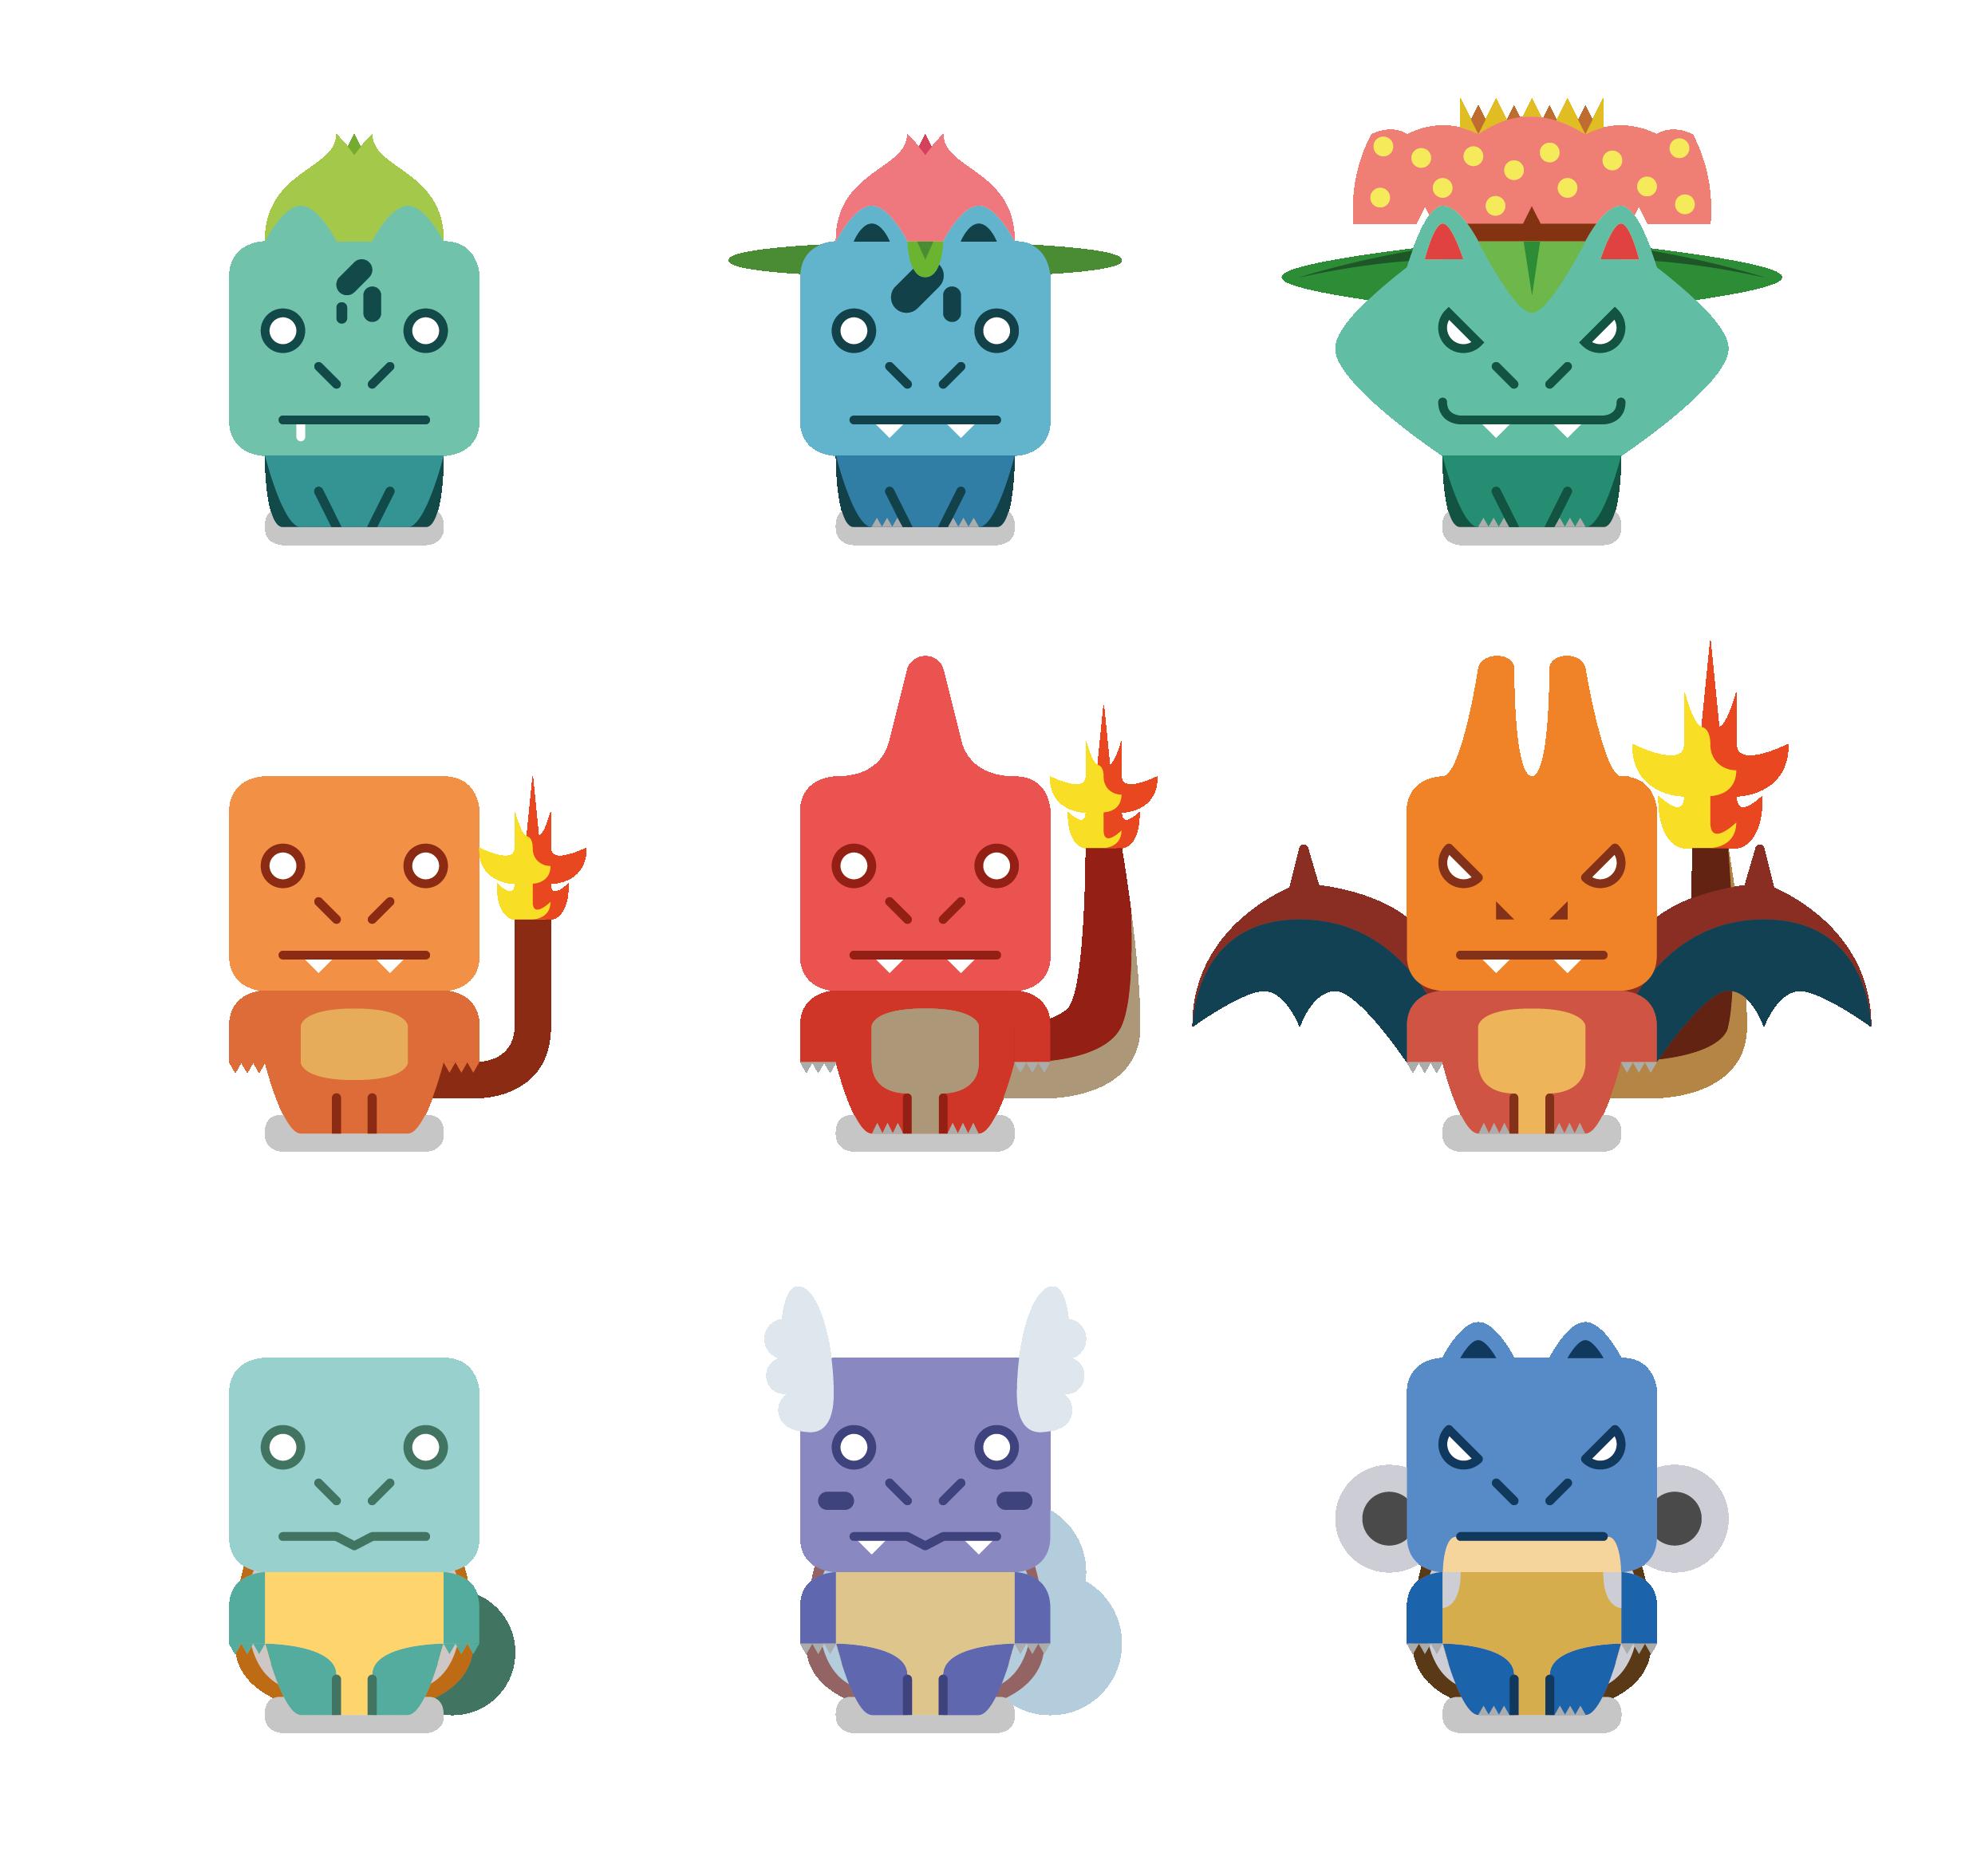 Echa un vistazo a mi proyecto @Behance: \u201cBasic Pokemon\u201d https://www.behance.net/gallery/49895715/Basic-Pokemon